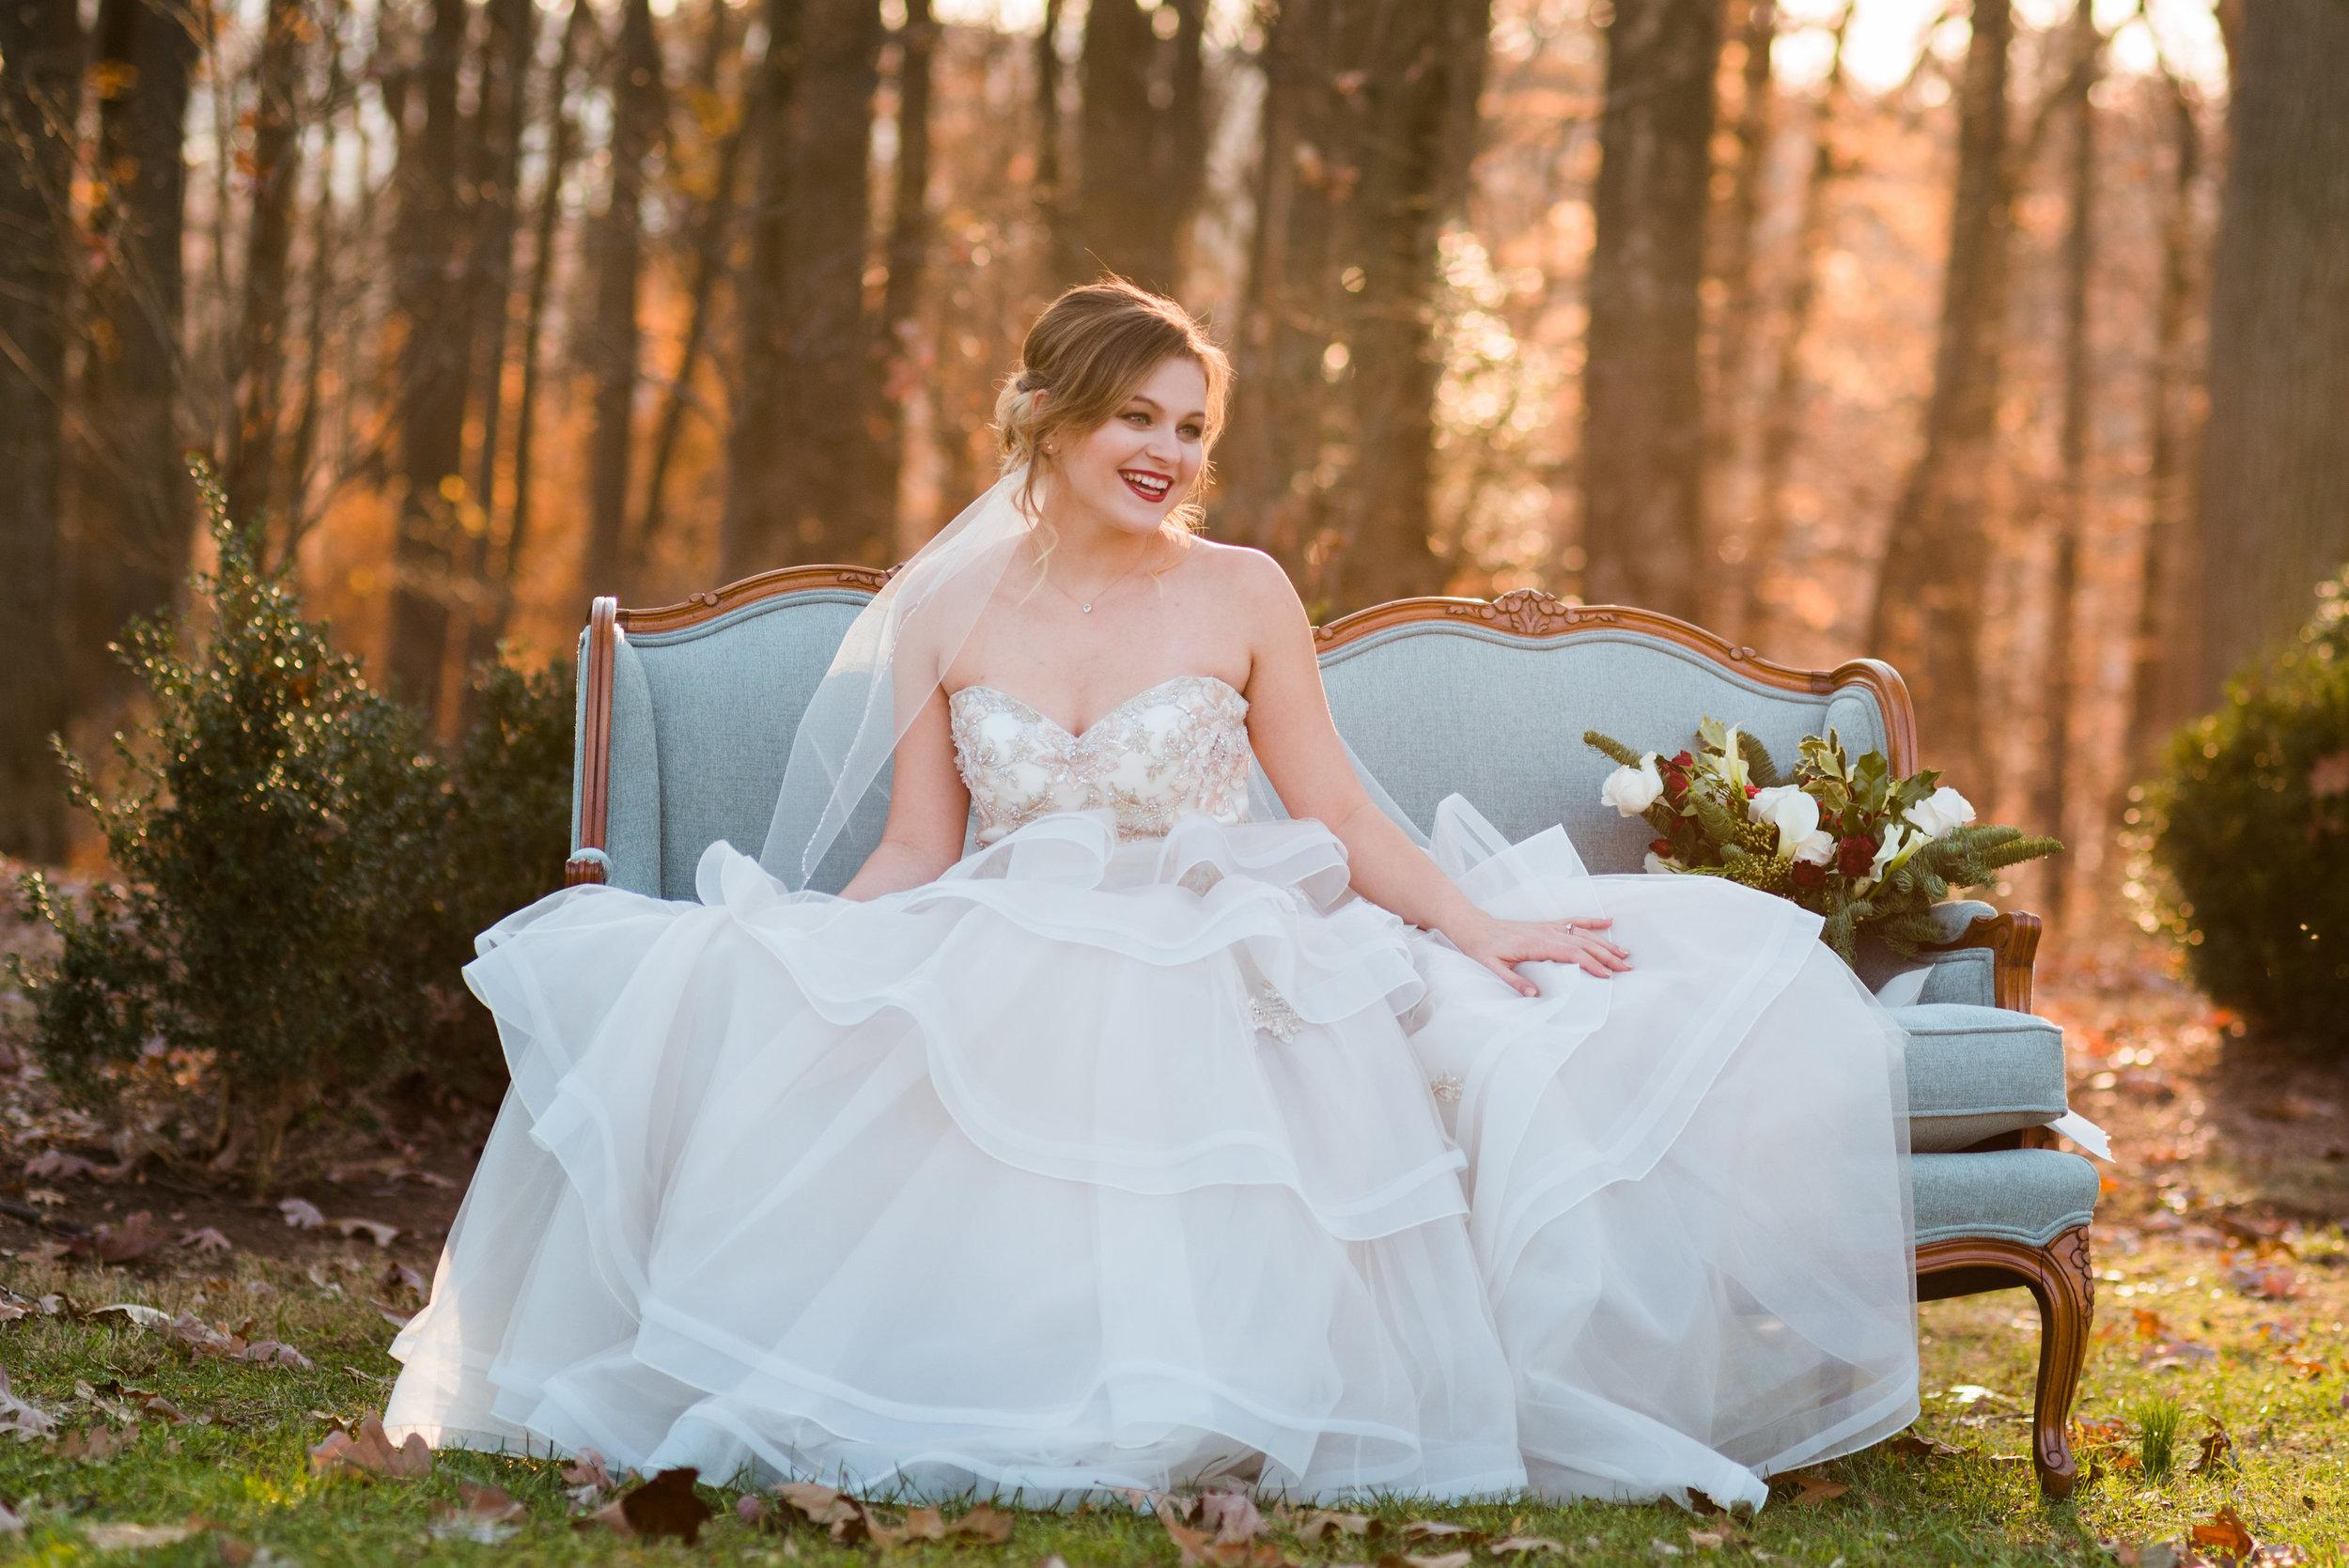 maryland-wedding-photographer-laremore-christmas-wedding-158.jpg